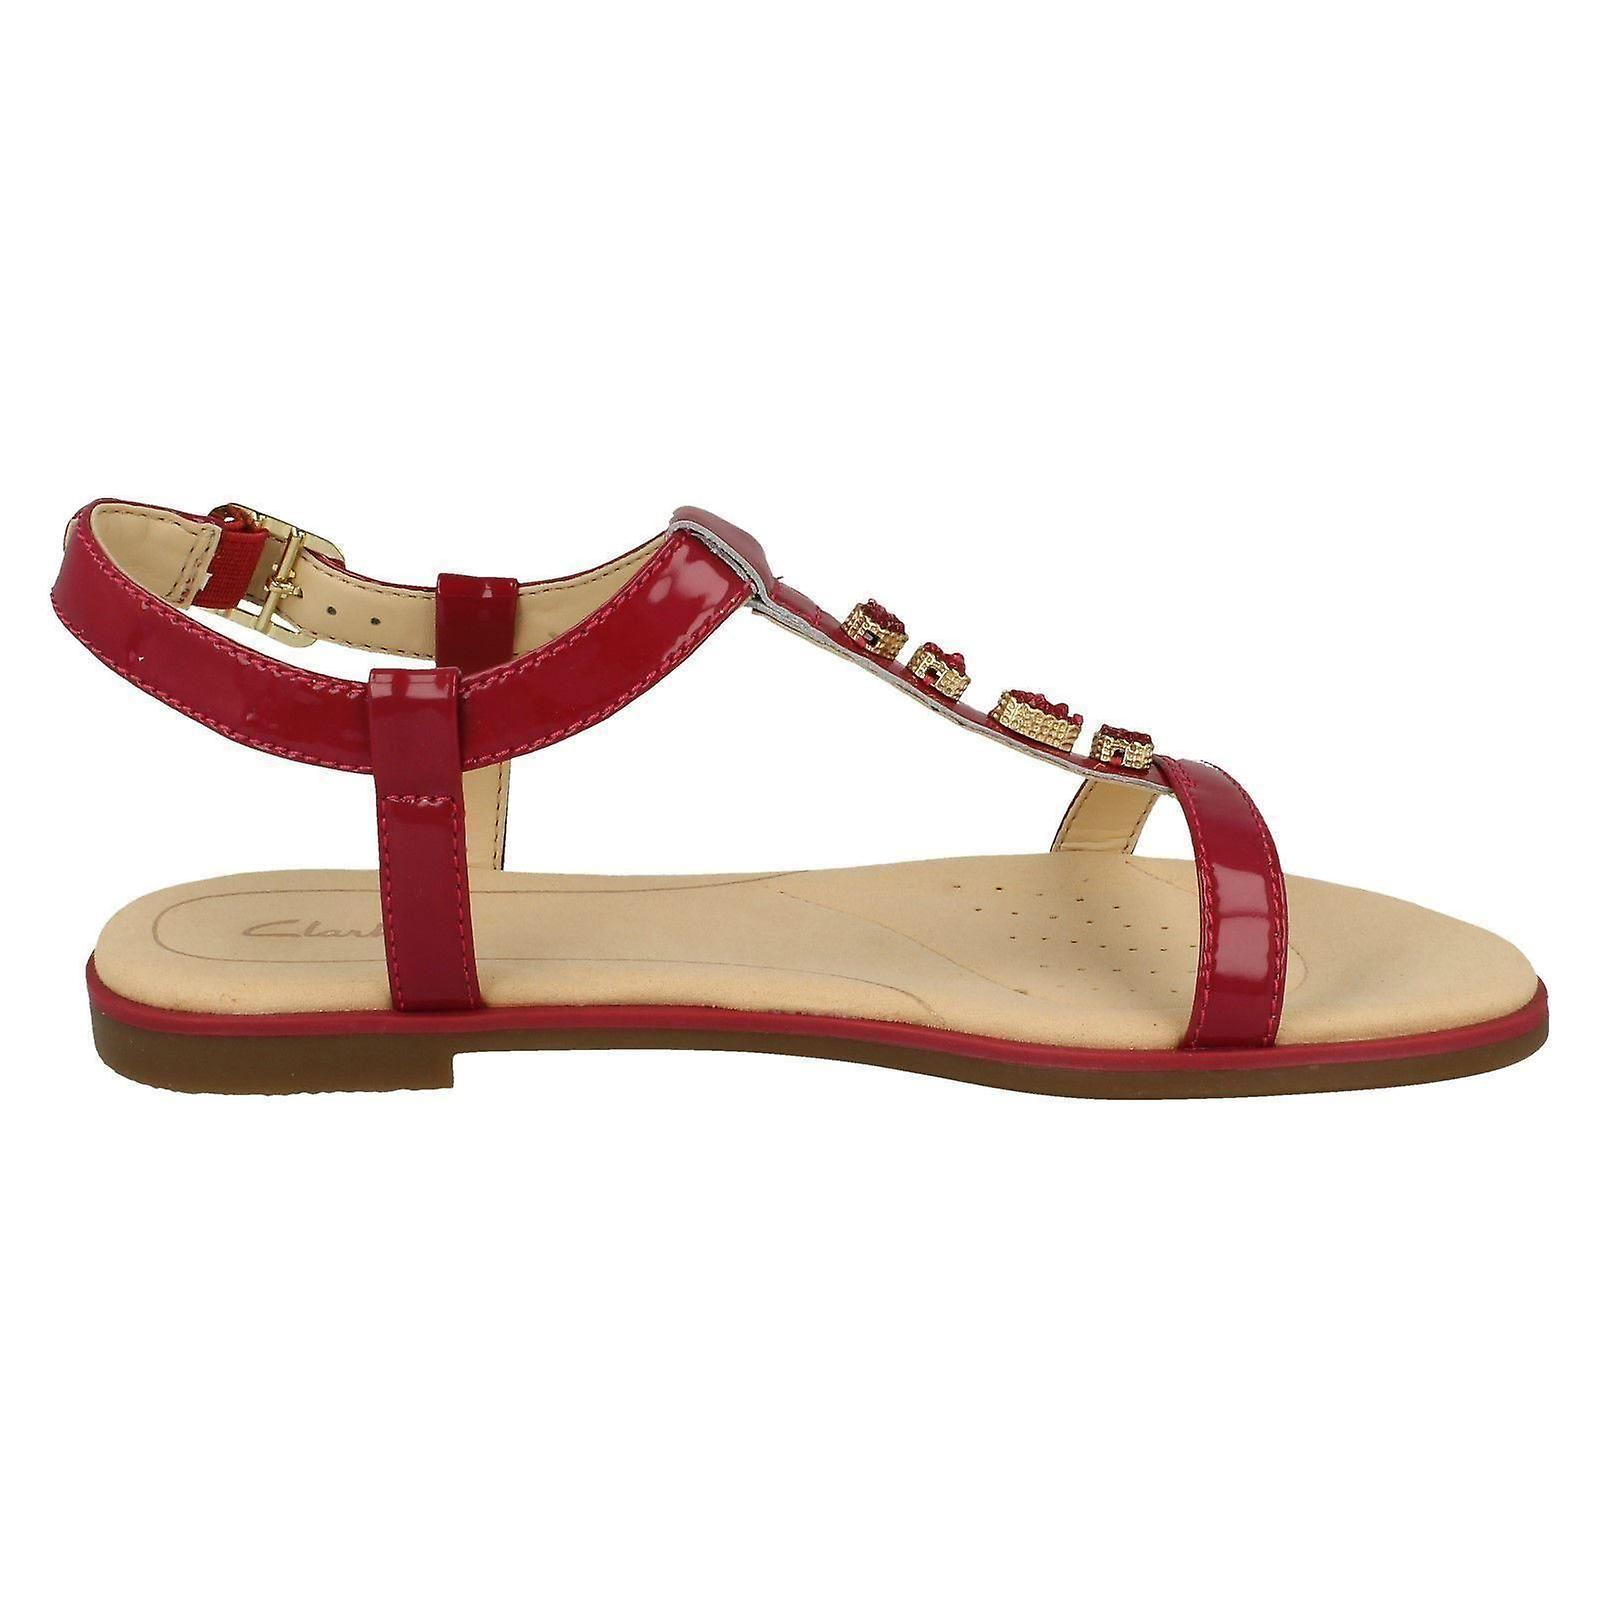 2b8dc7db8f64c Ladies Clarks Casual Slingback Sandals Bay Blossom - Fuchsia Patent Leather  - UK Size 6.5D